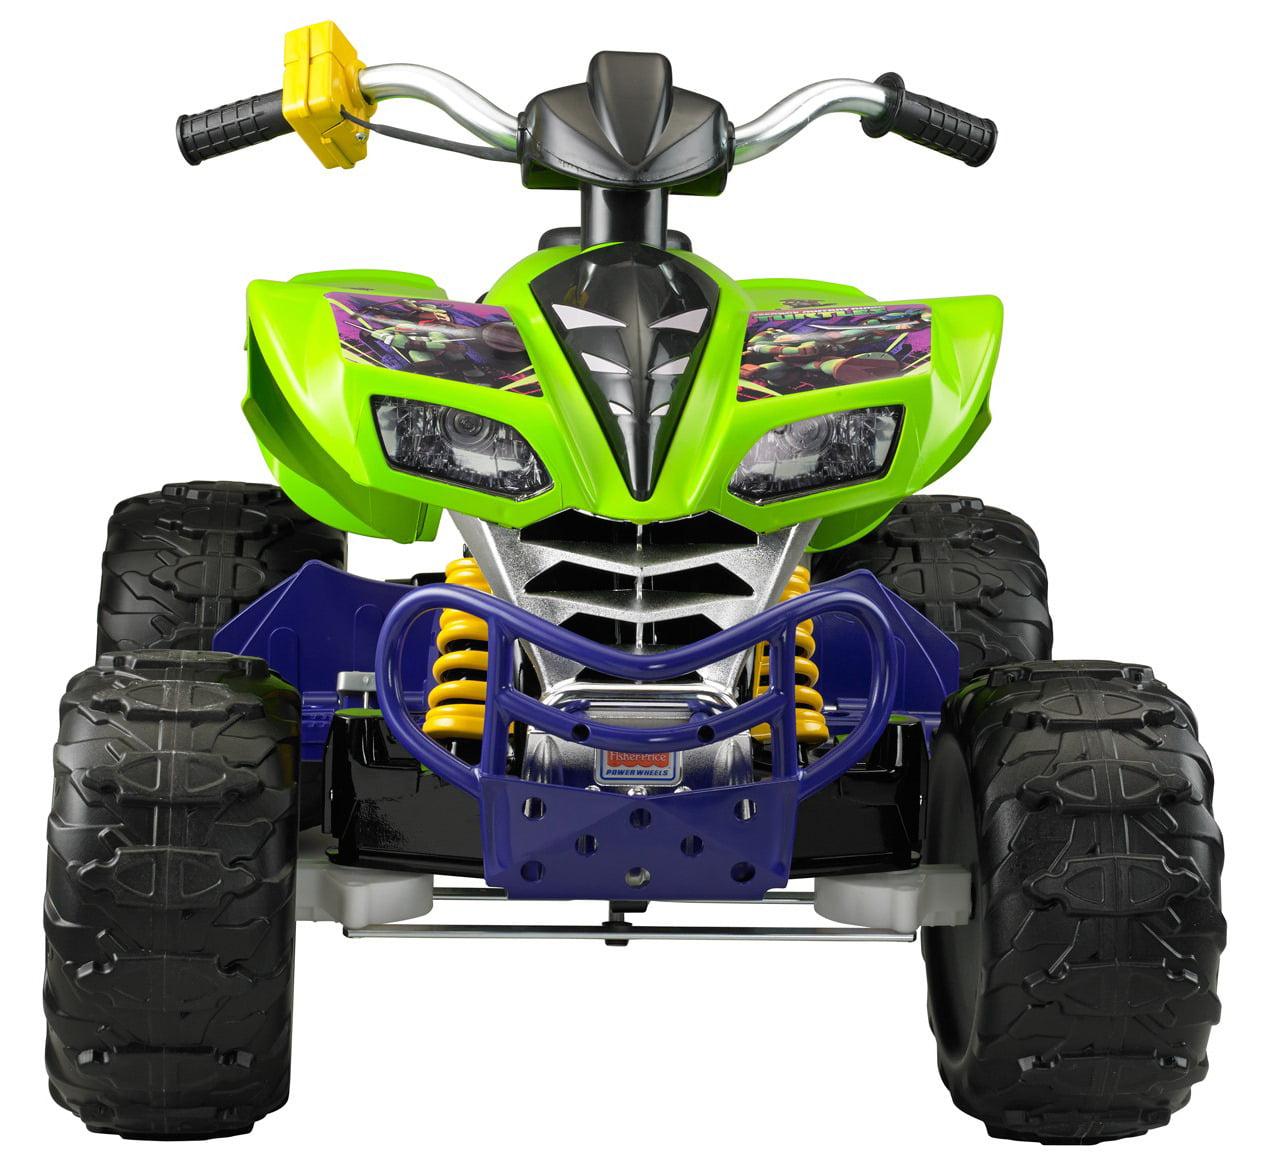 Wheels Age Mutant Ninja Turtles Kawasaki Kfx 12 Volt Ride On